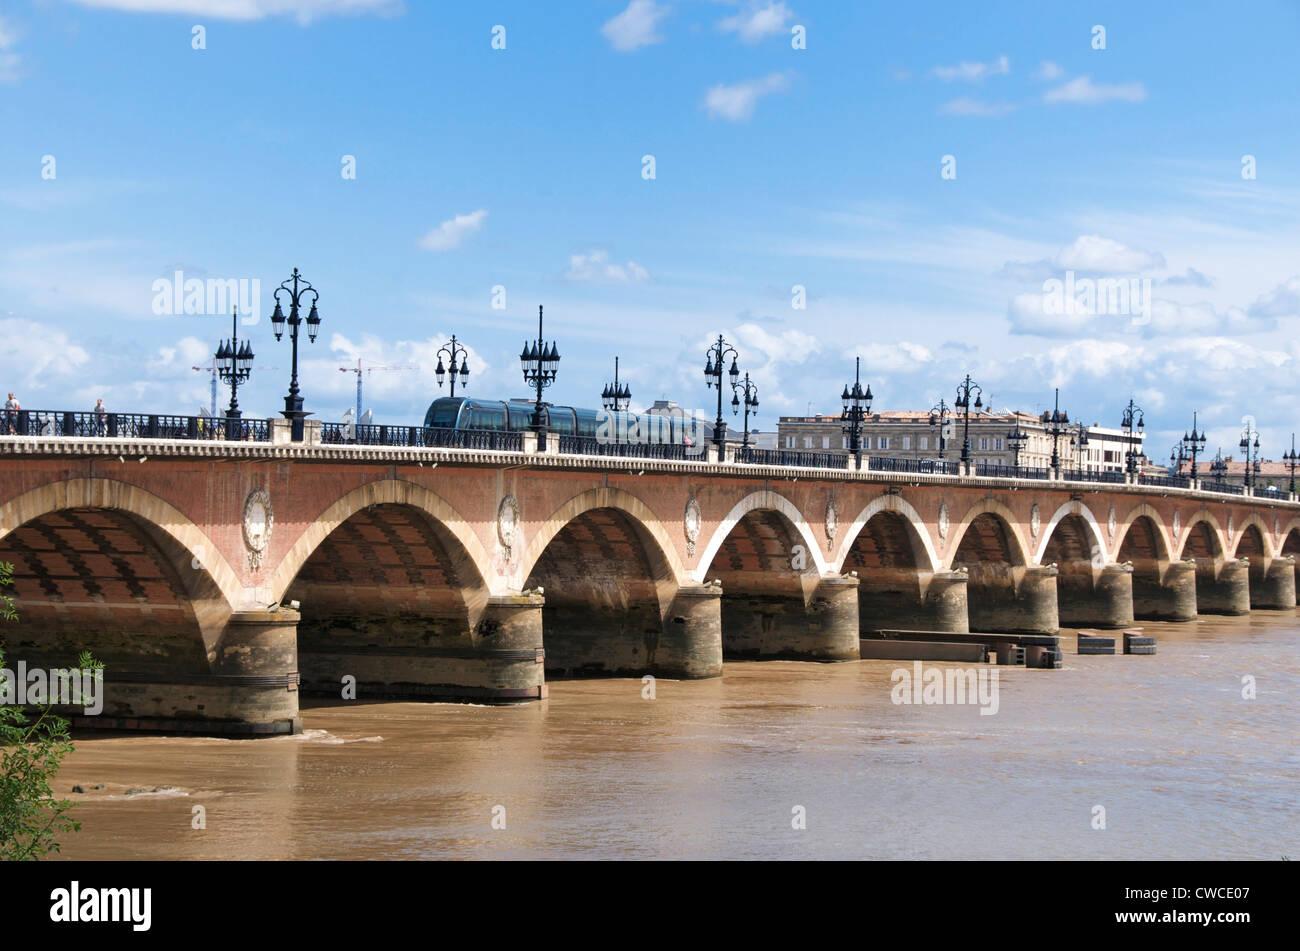 Straßenbahn Kreuzung Pont de Pierre, Bordeaux, Gironde, Frankreich, Europa Stockbild